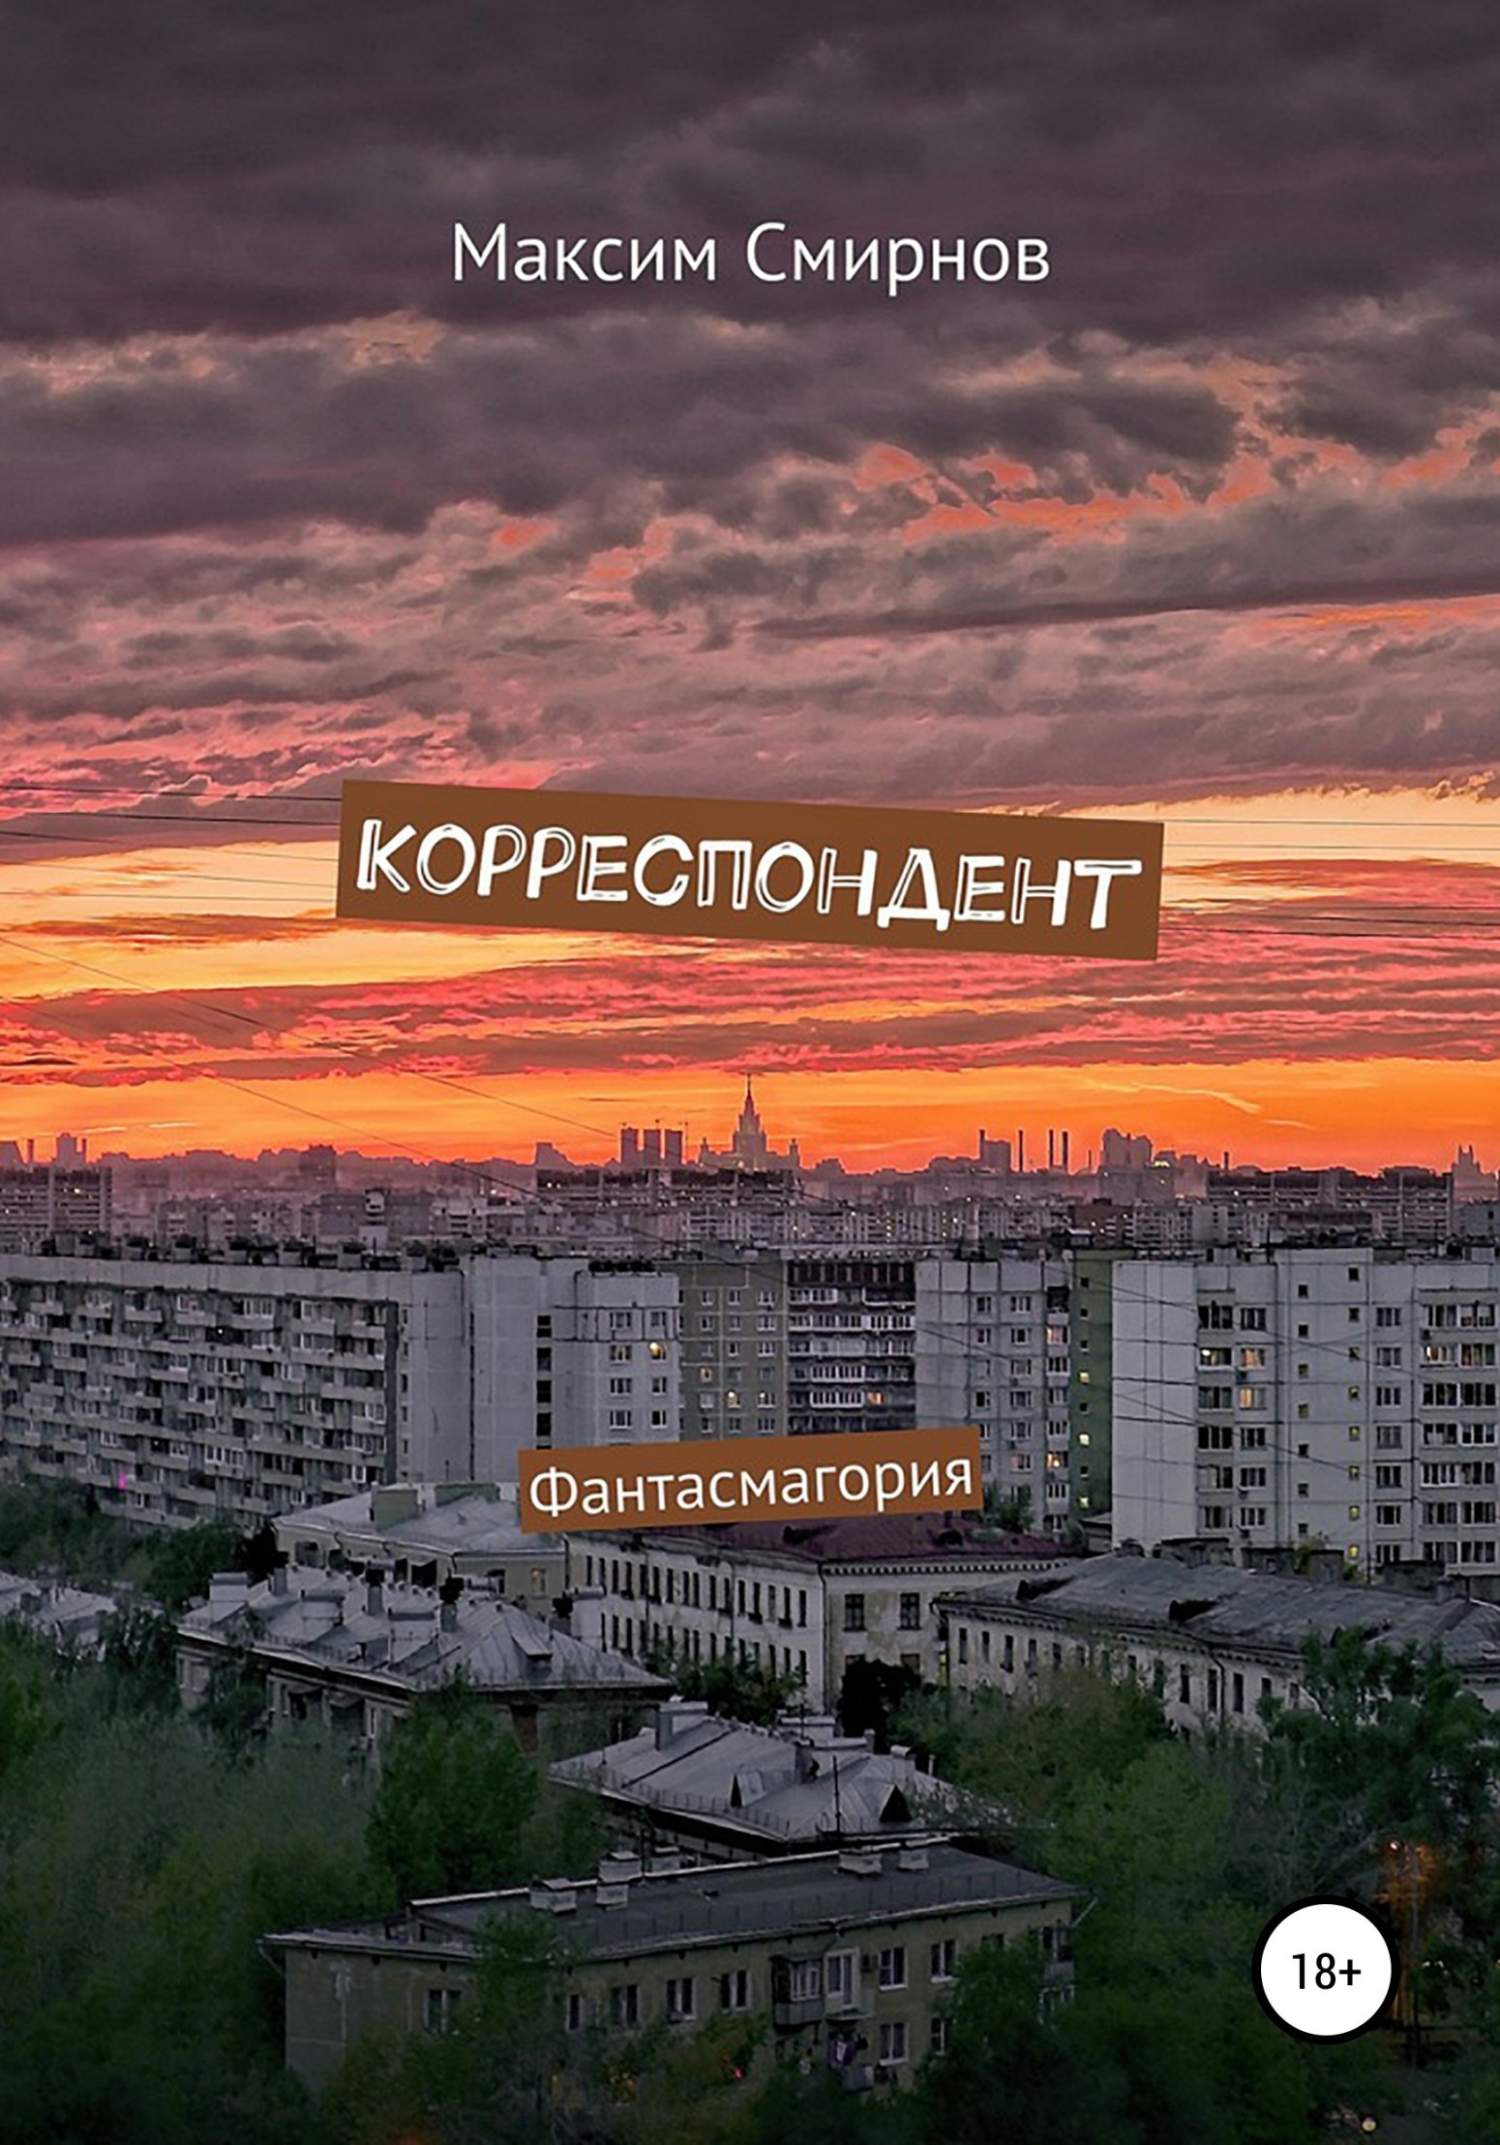 Корреспондент. Фантасмагория